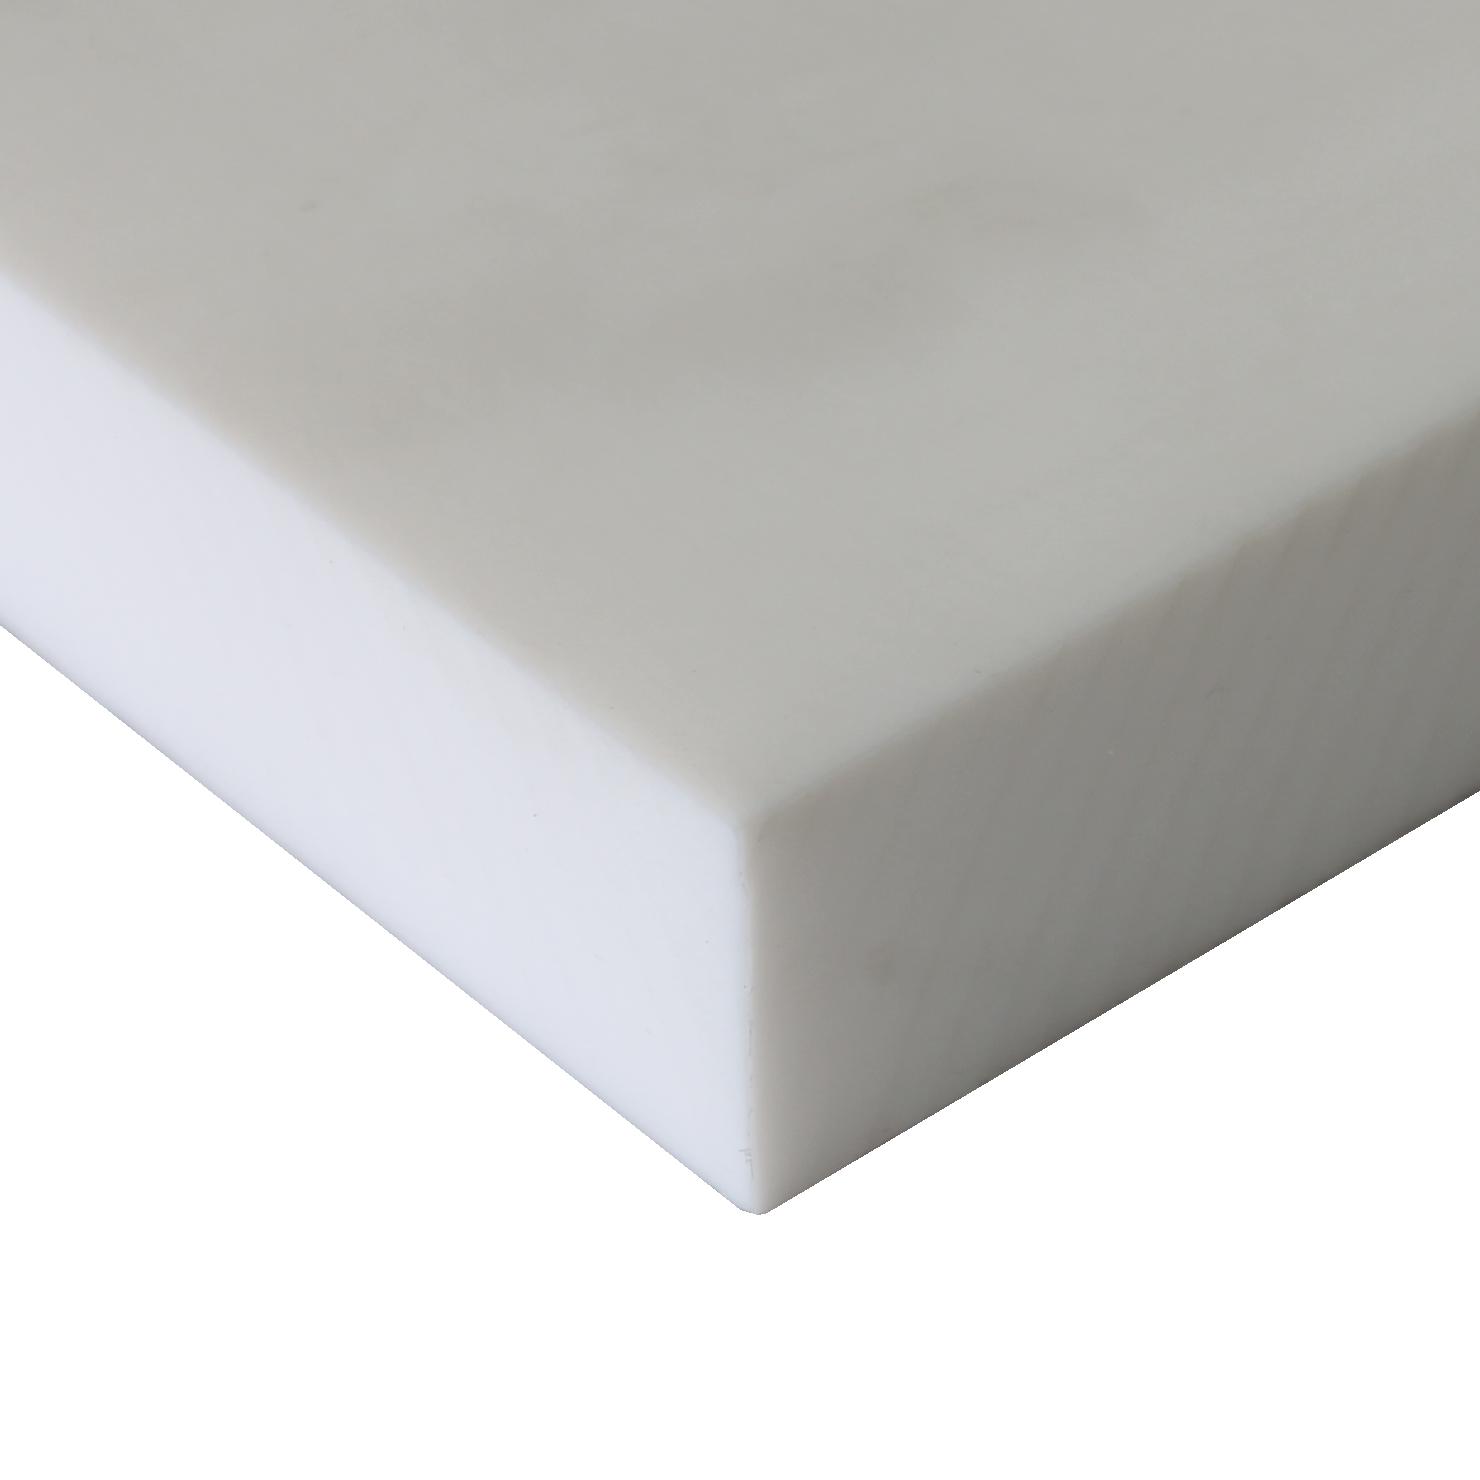 transparent library transparent sheet teflon #106496995